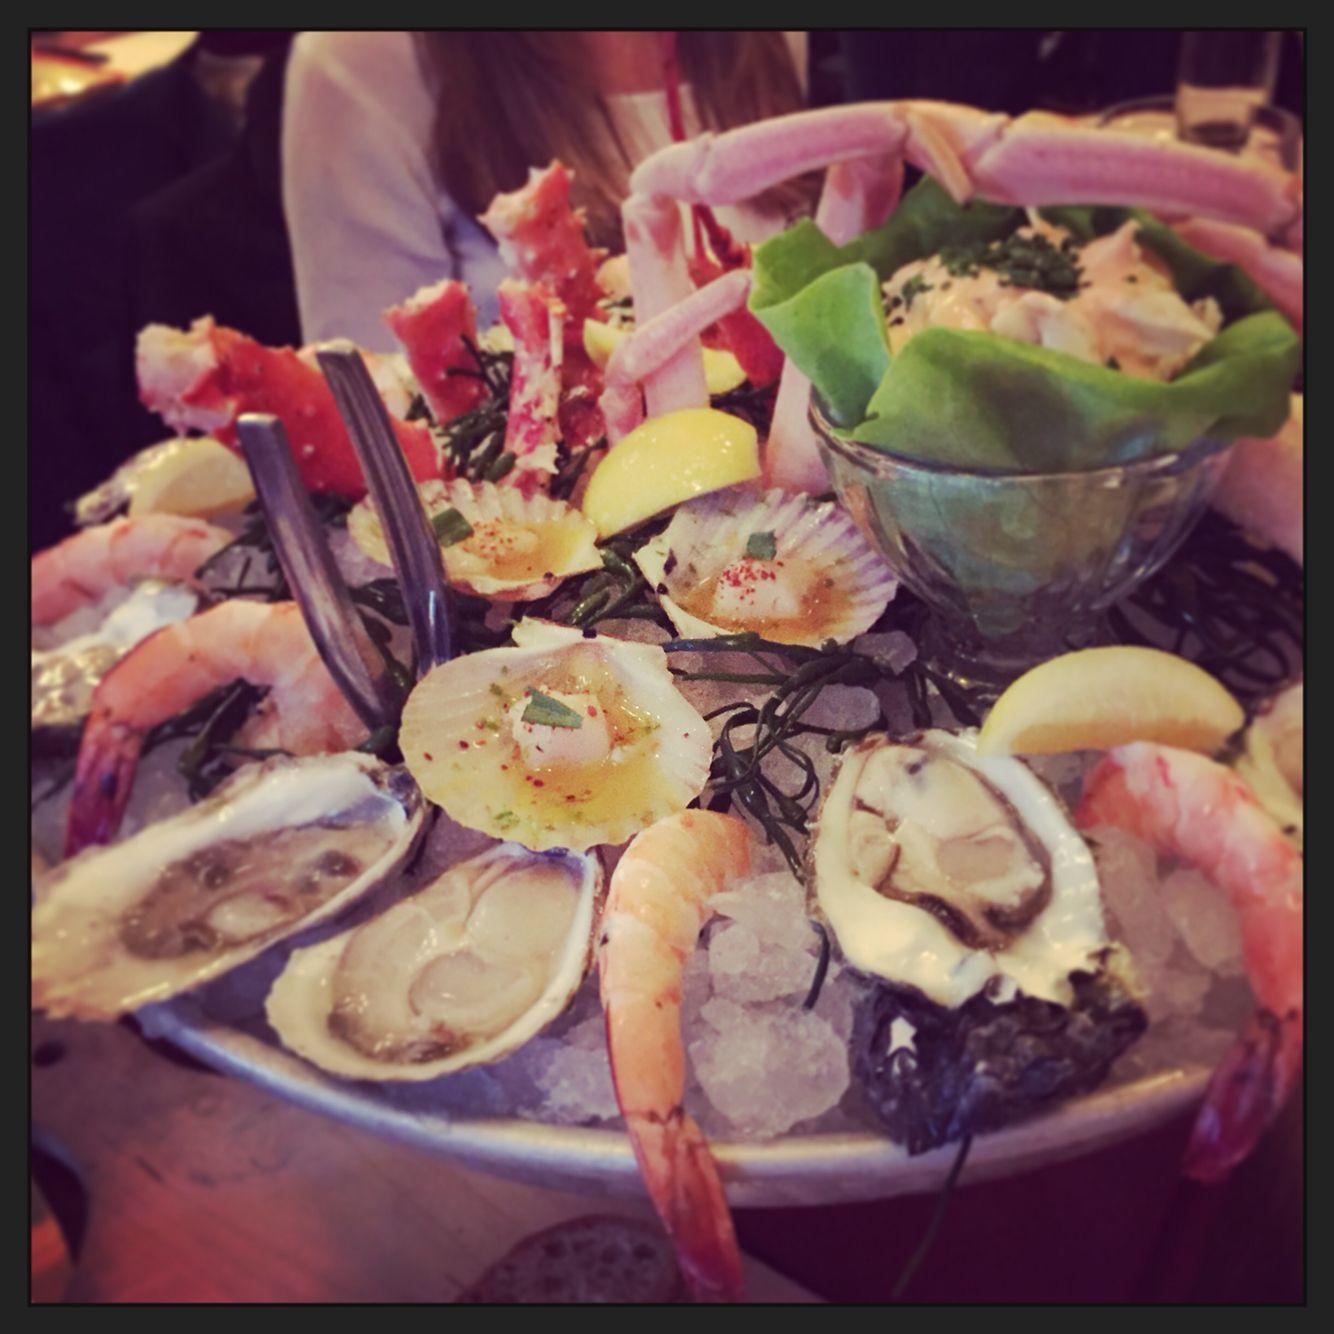 Seafood platter- Le Diplomat, Washington, D.C.